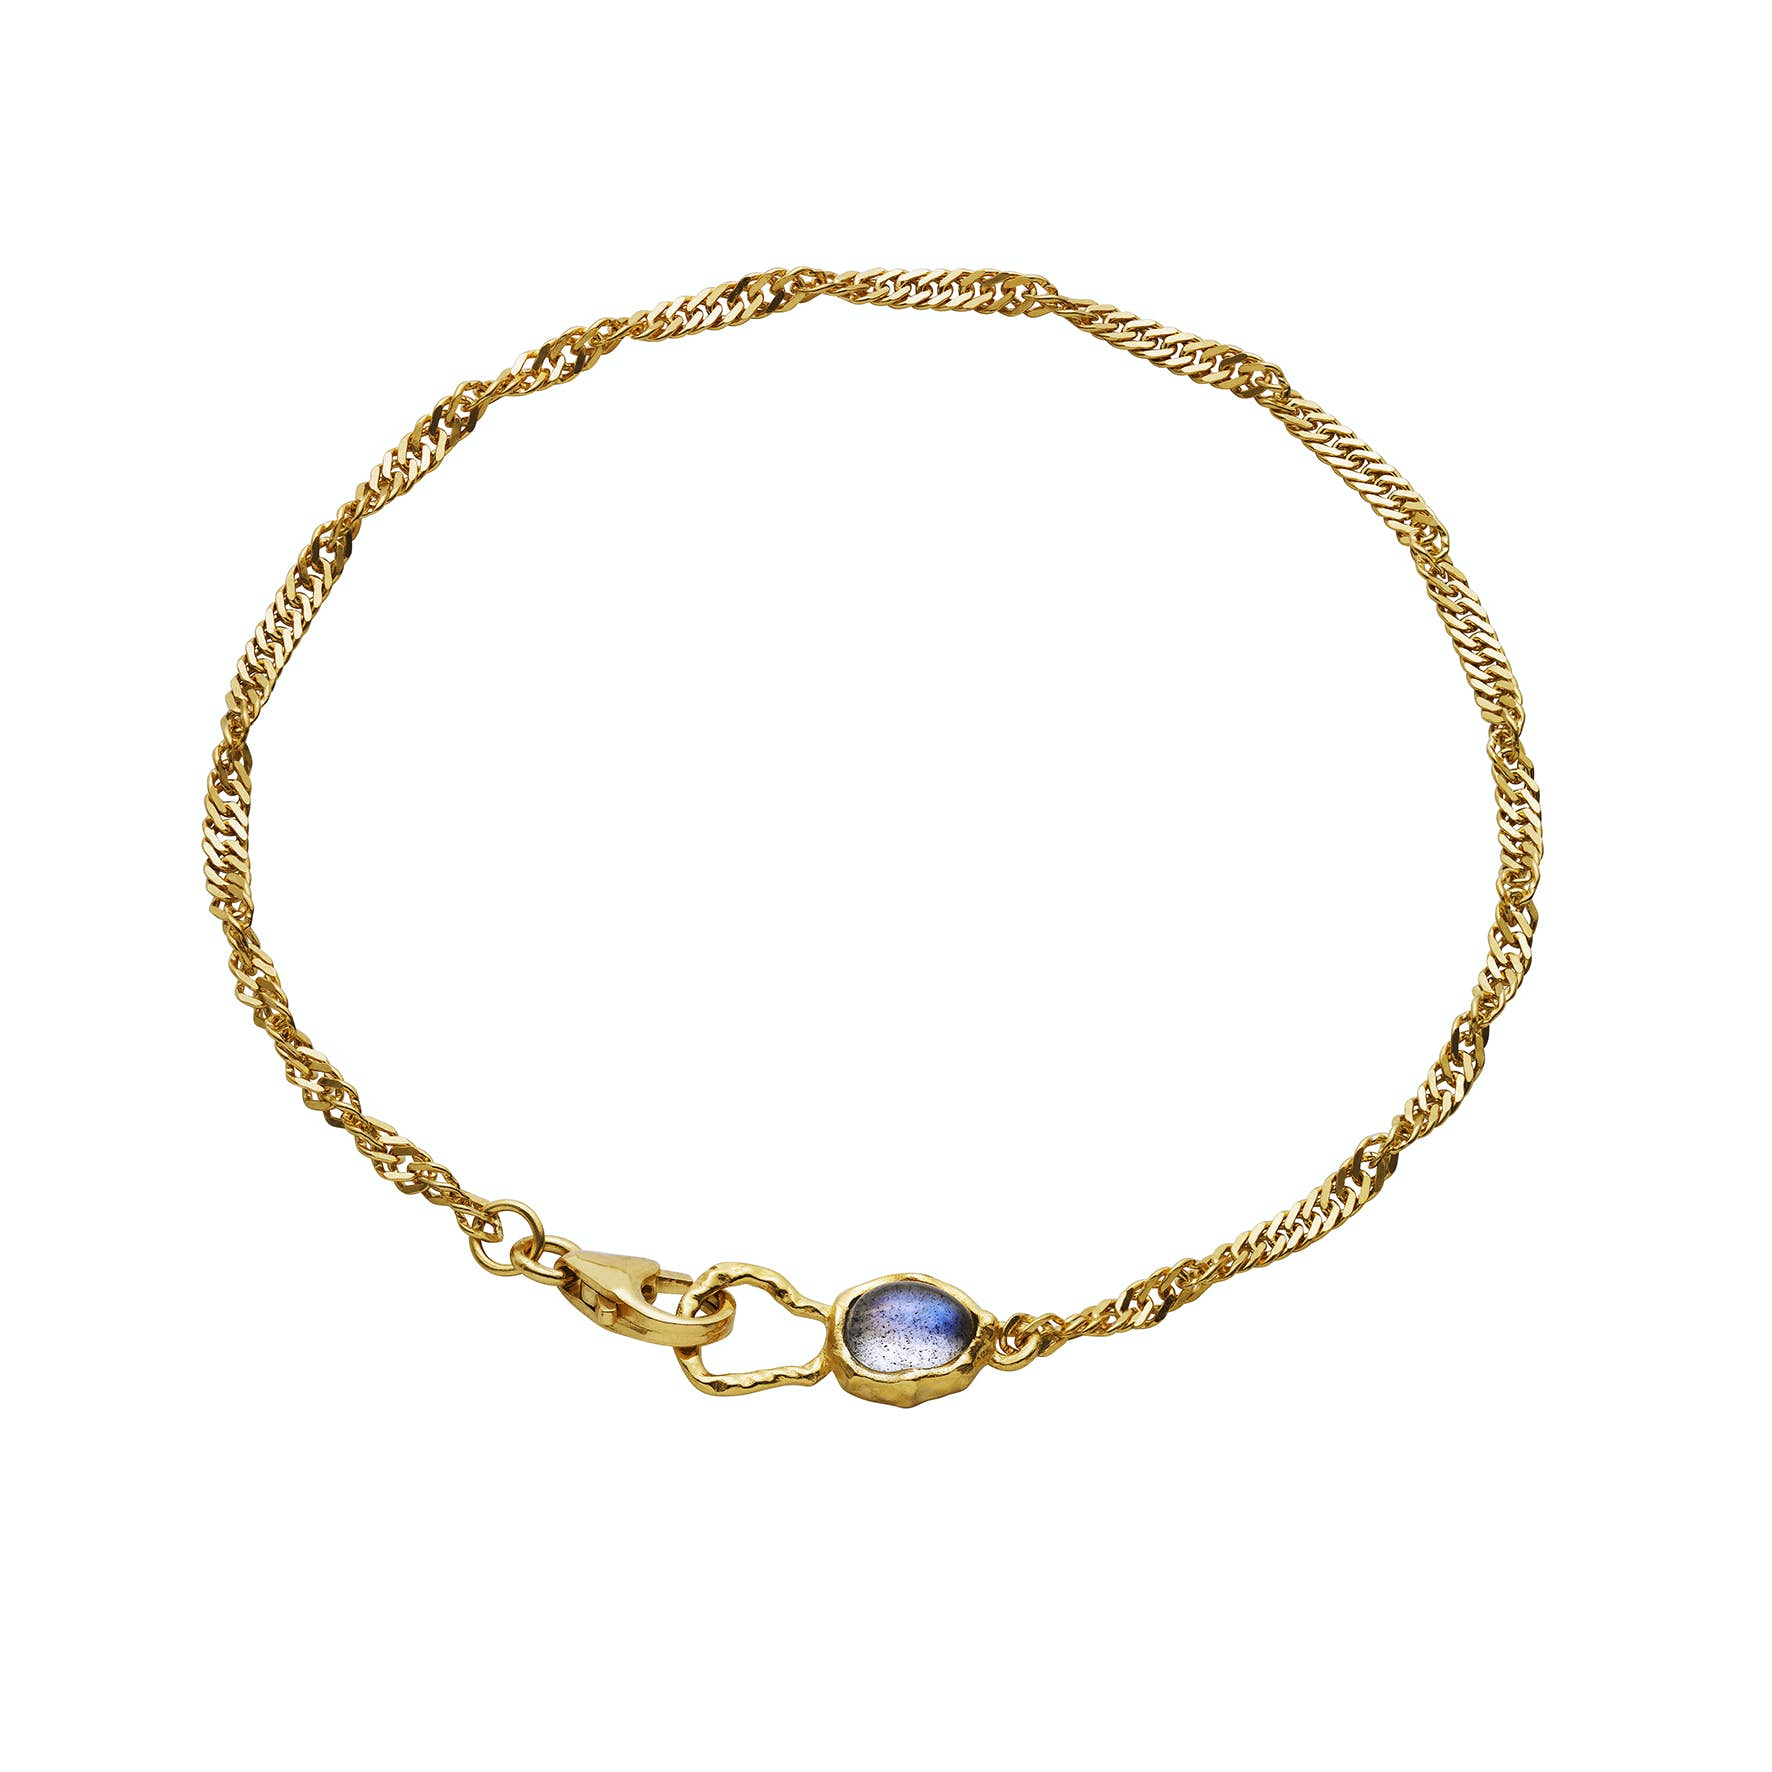 Perilla Bracelet von Maanesten in Vergoldet-Silber Sterling 925